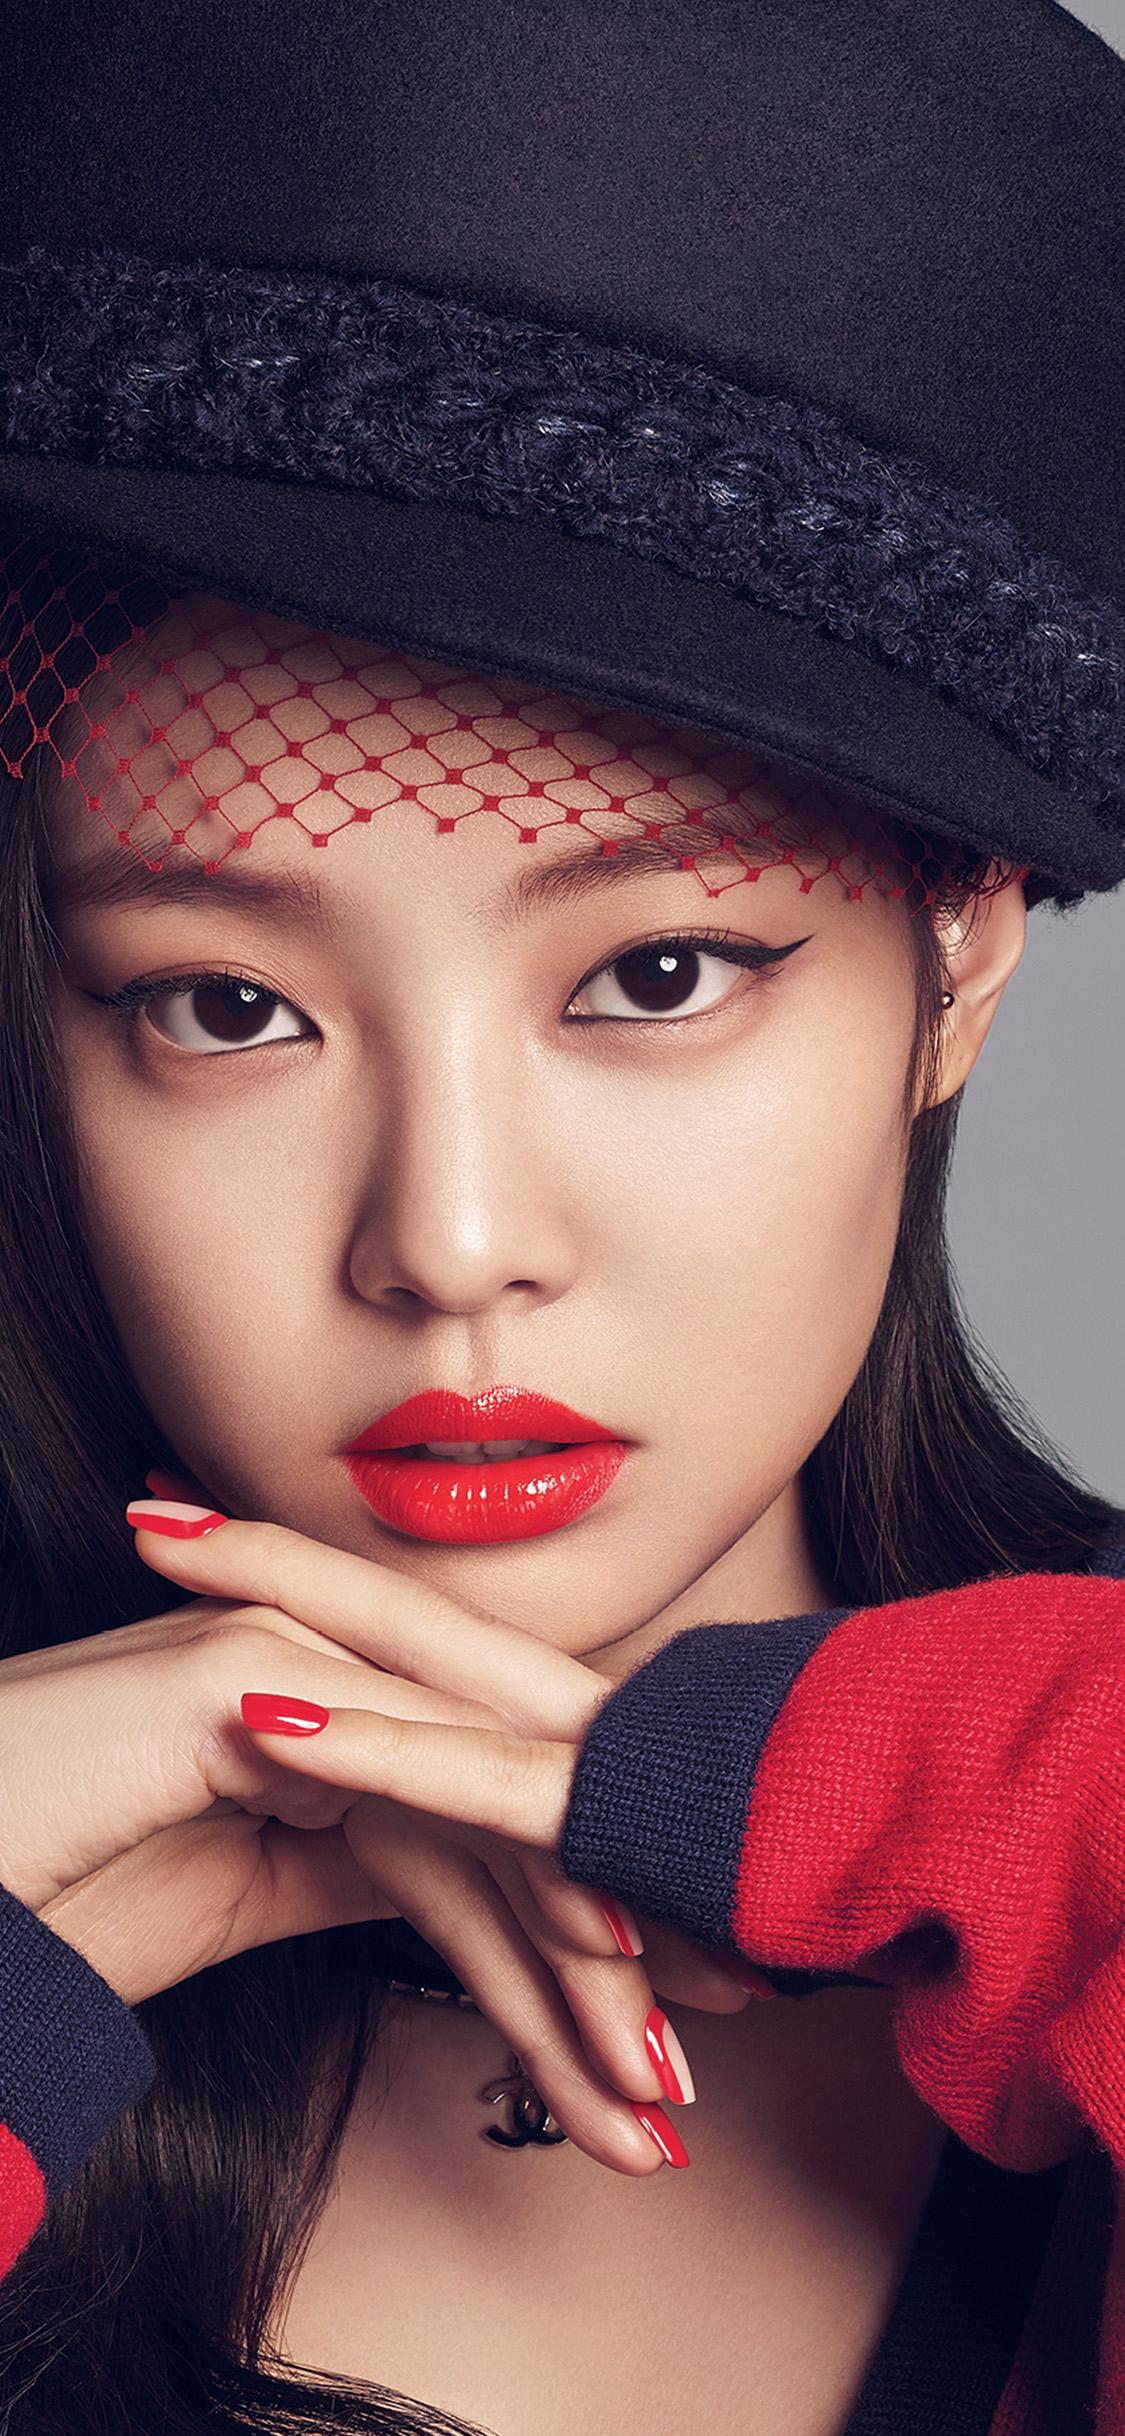 Simple Wallpaper Girl Hd Hp37 Blackpink Girl Kpop Jennie Wallpaper